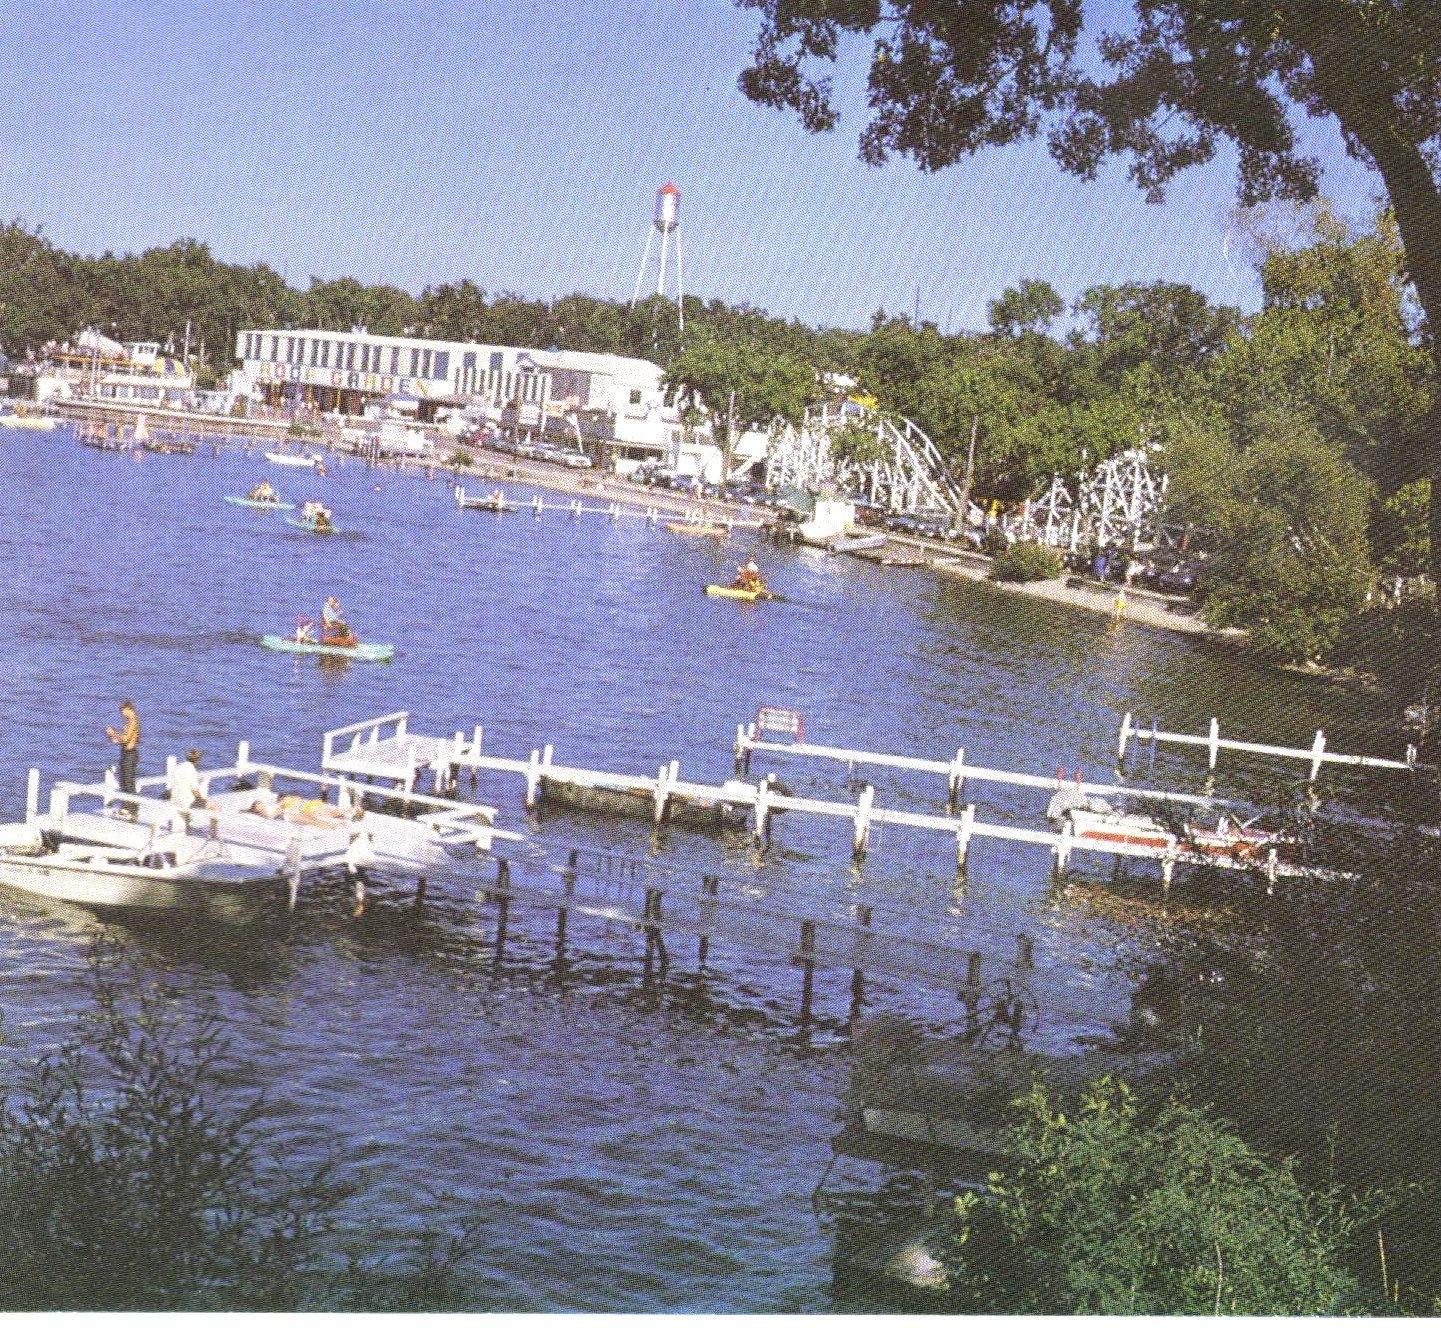 Okoboji stories views of arnolds park for Lake okoboji fishing